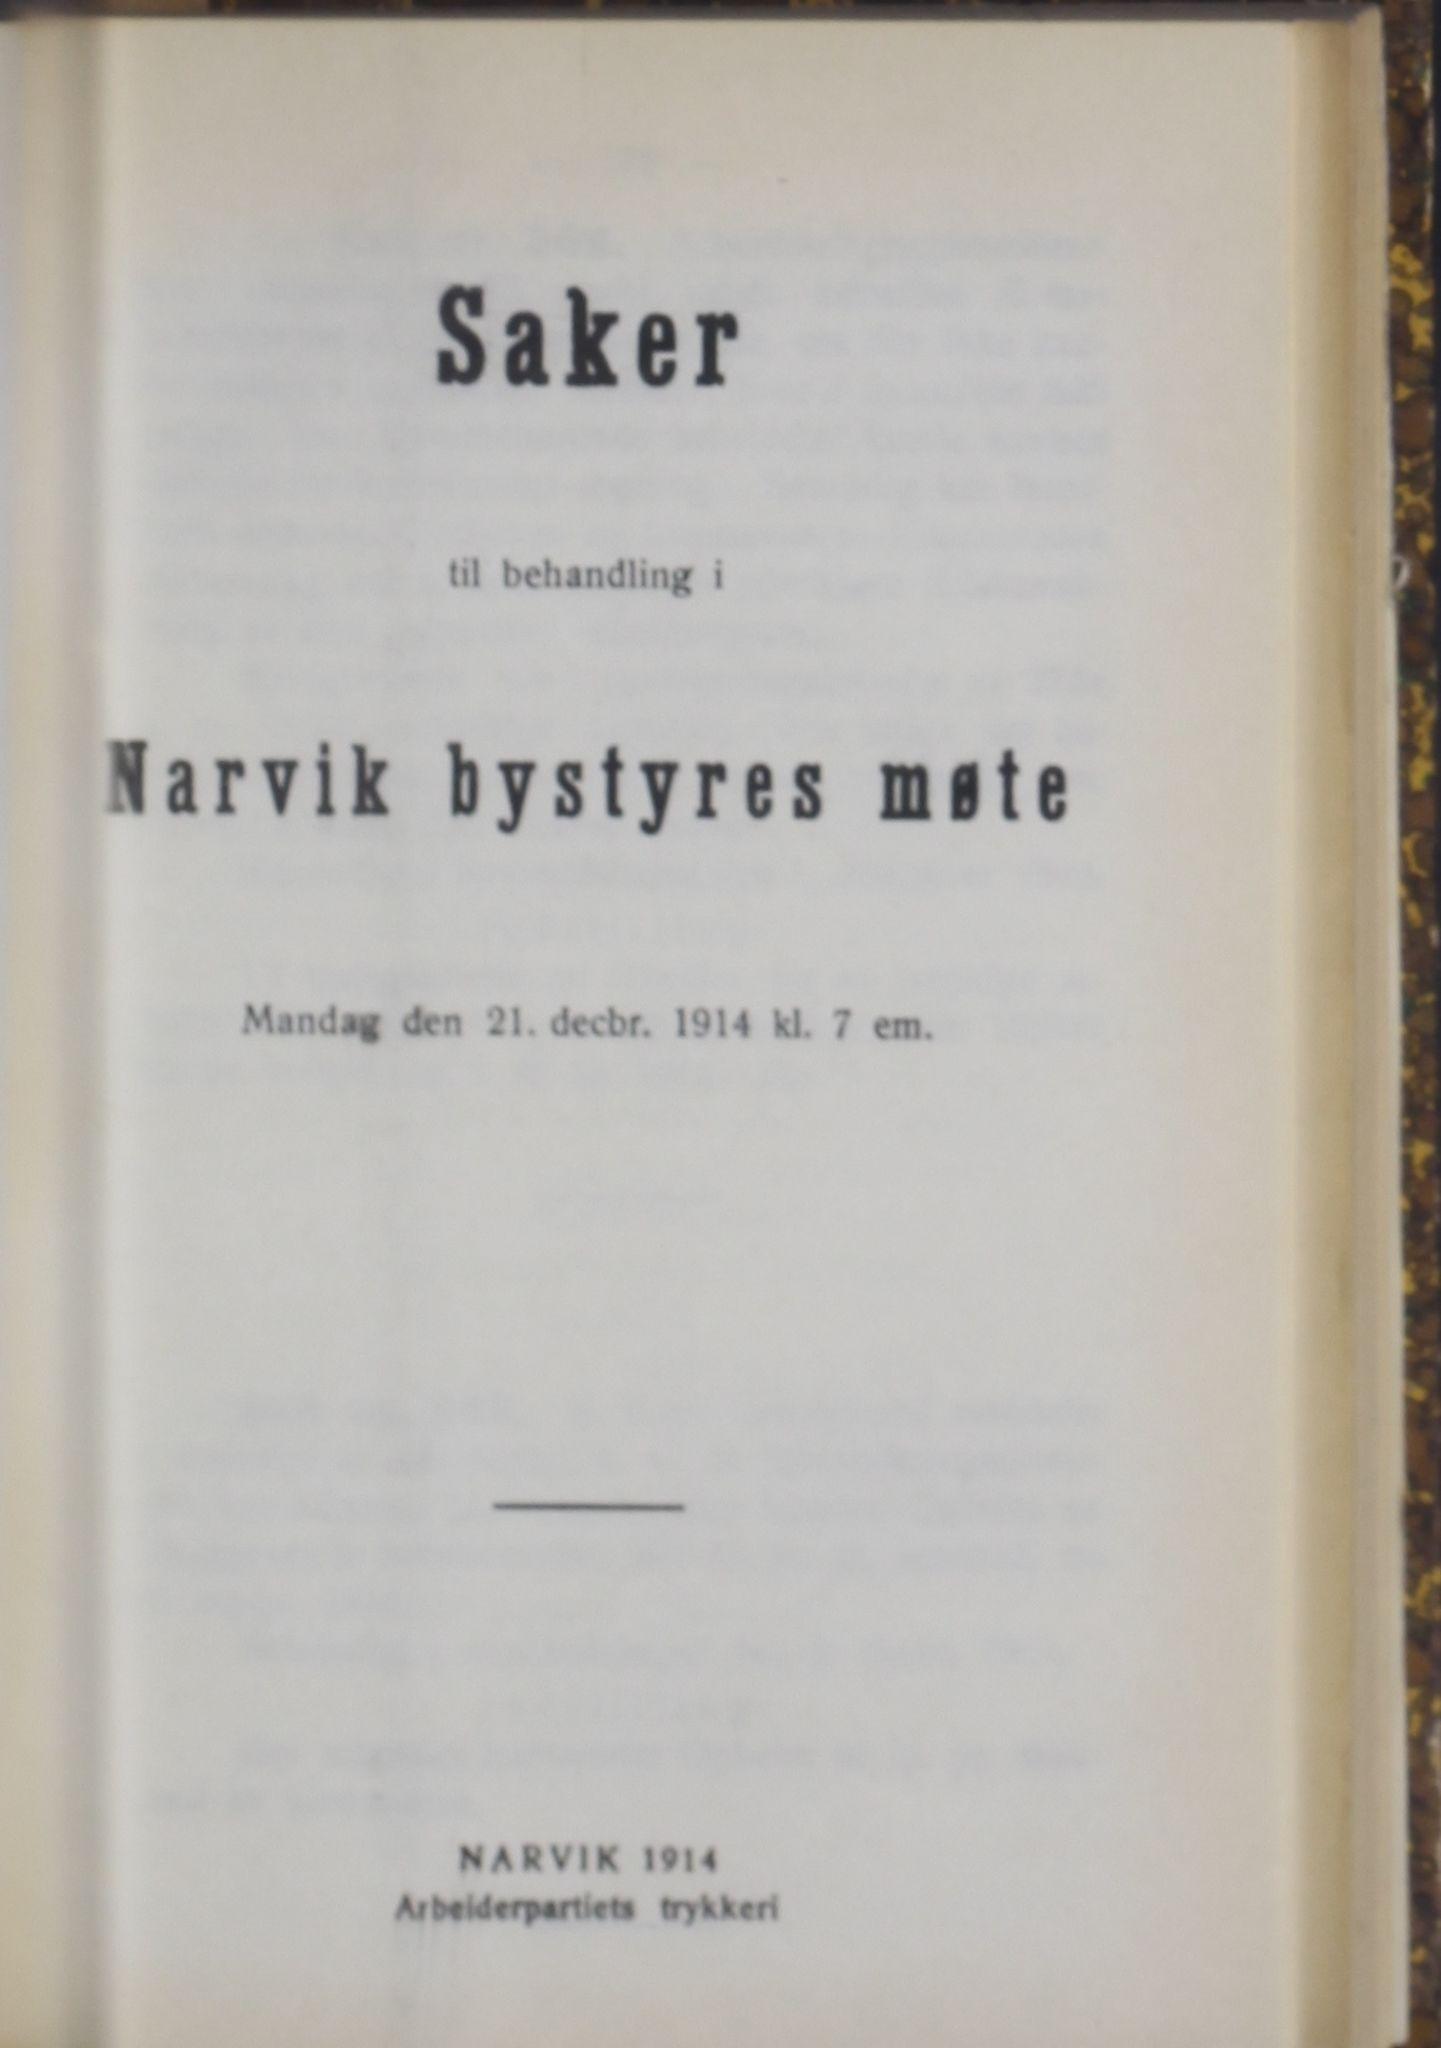 AIN, Narvik kommune. Formannskap , A/Ab/L0004: Møtebok, 1914